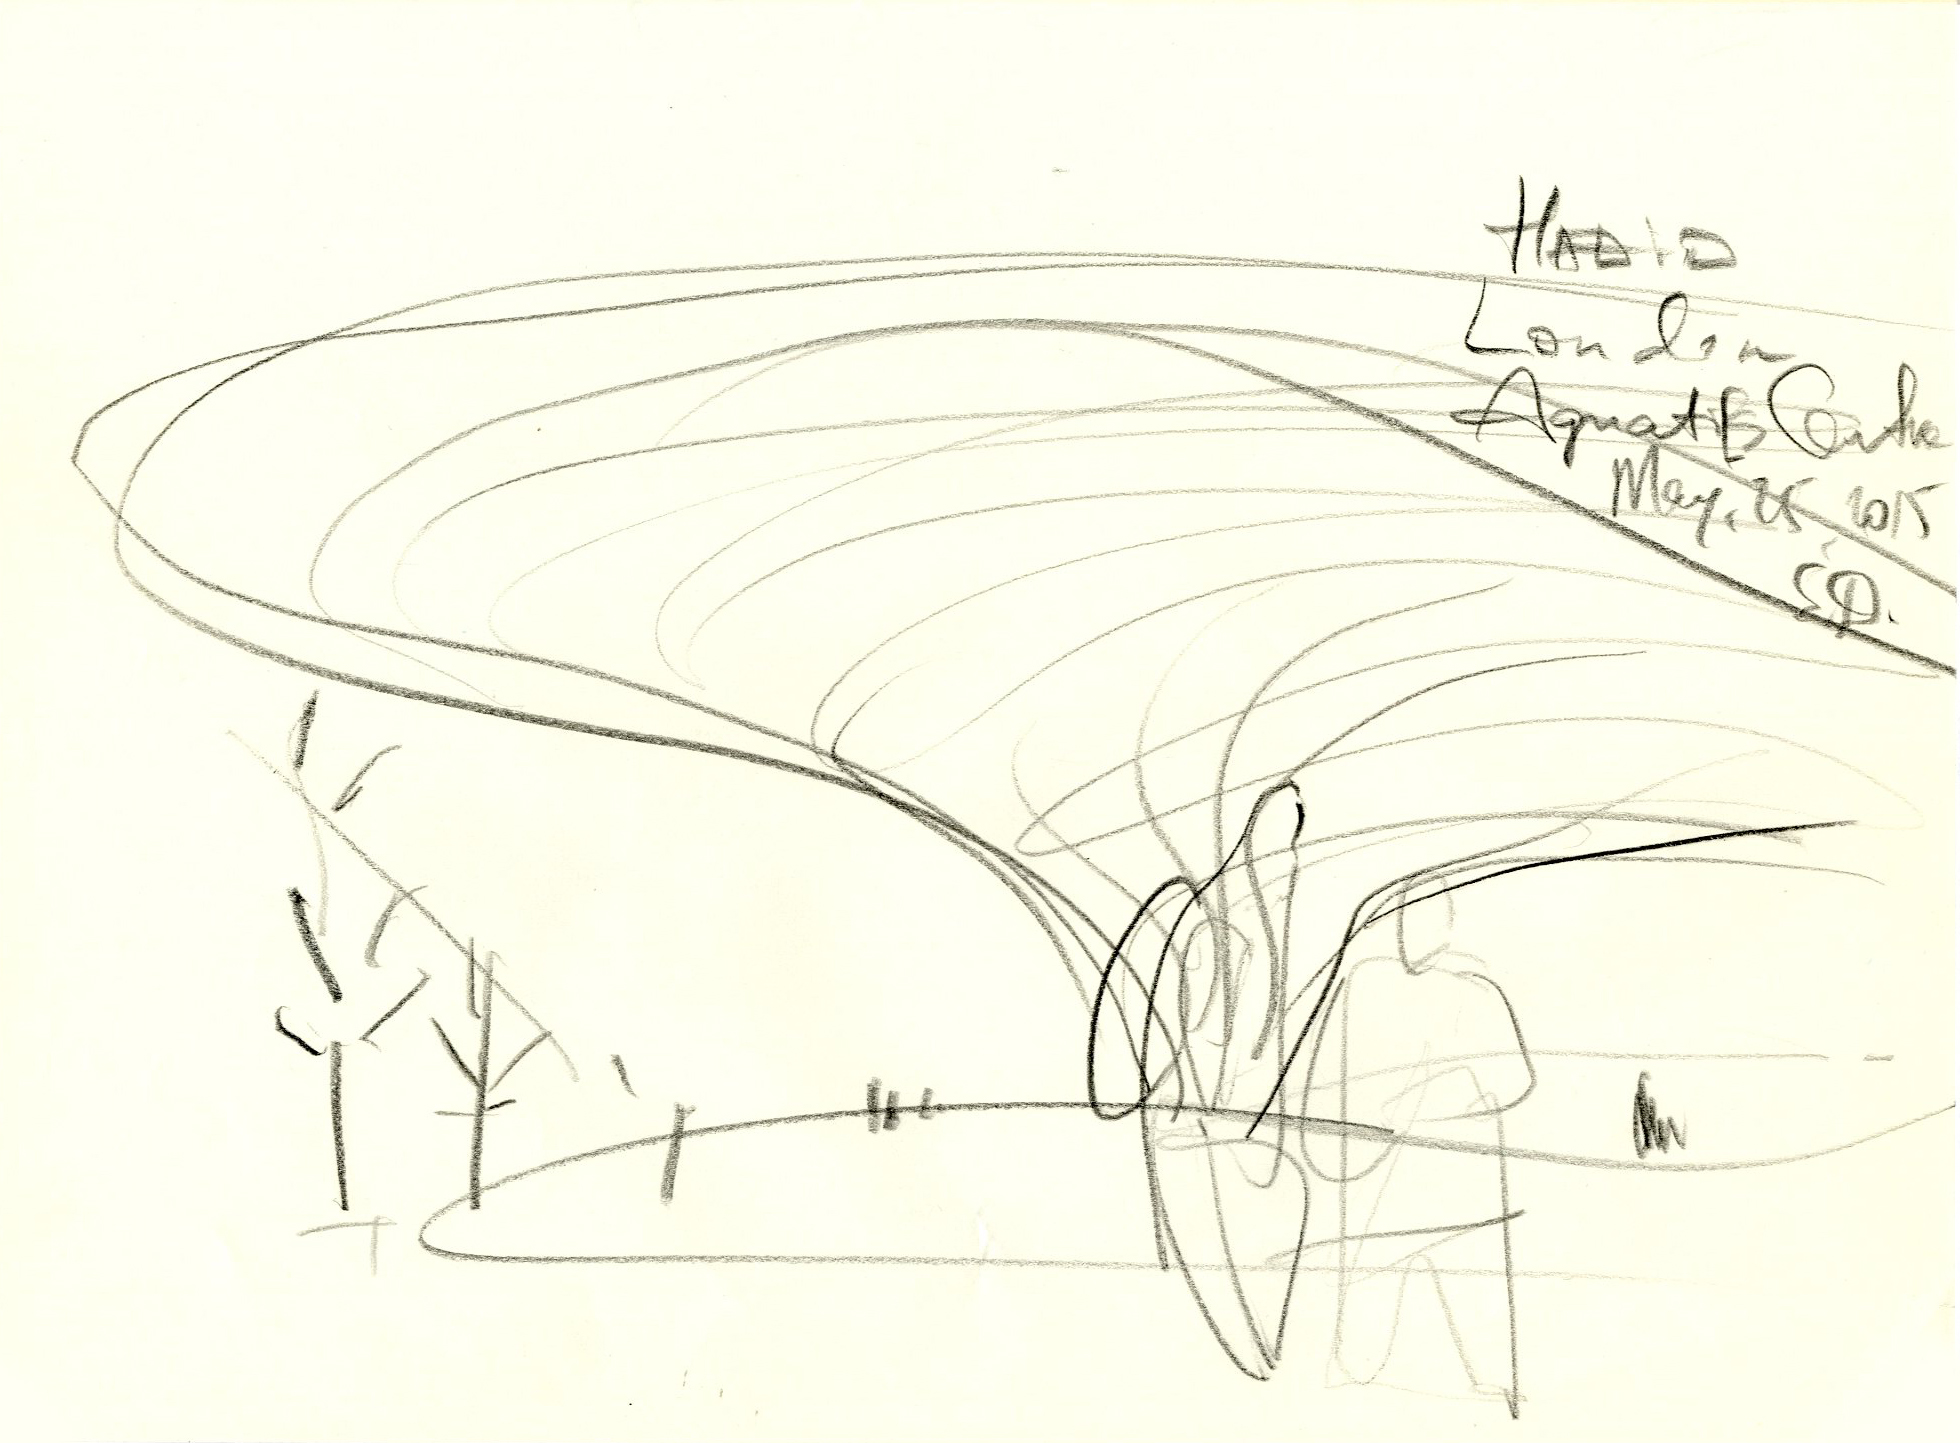 Aquatics Centre for Olympic games 2012  by Zaha Hadid Architects